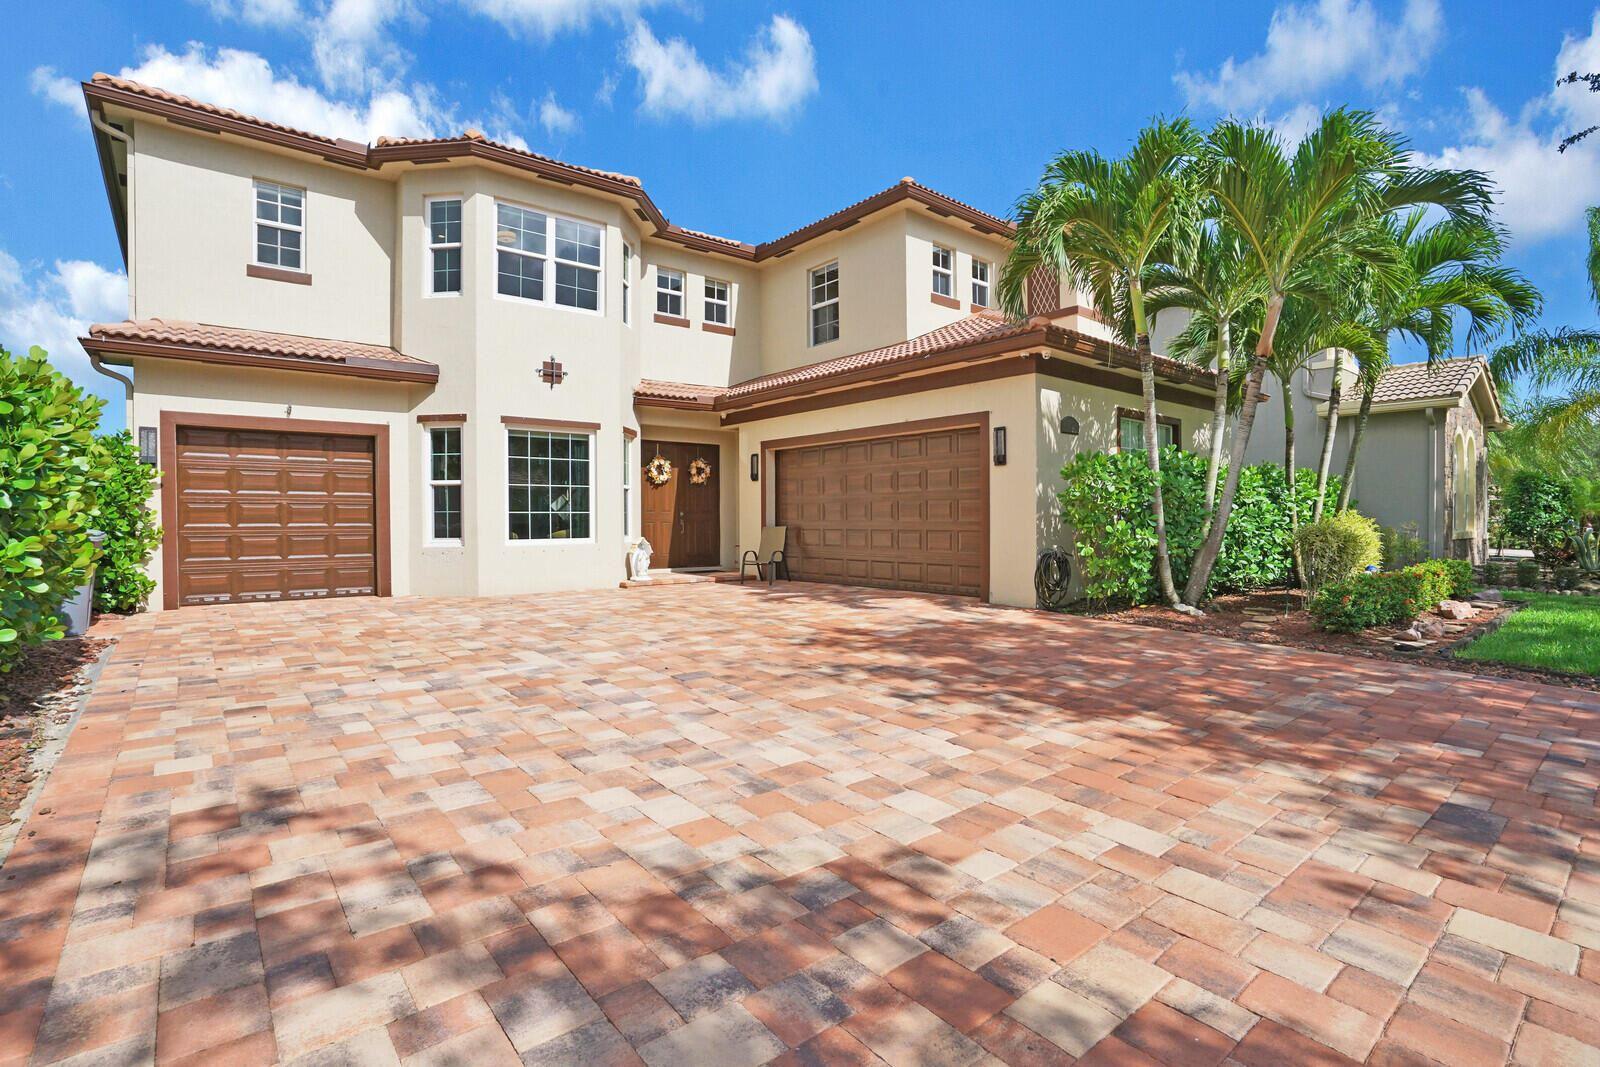 8615 Cobblestone Point Circle, Boynton Beach, FL 33472 - MLS#: RX-10745350